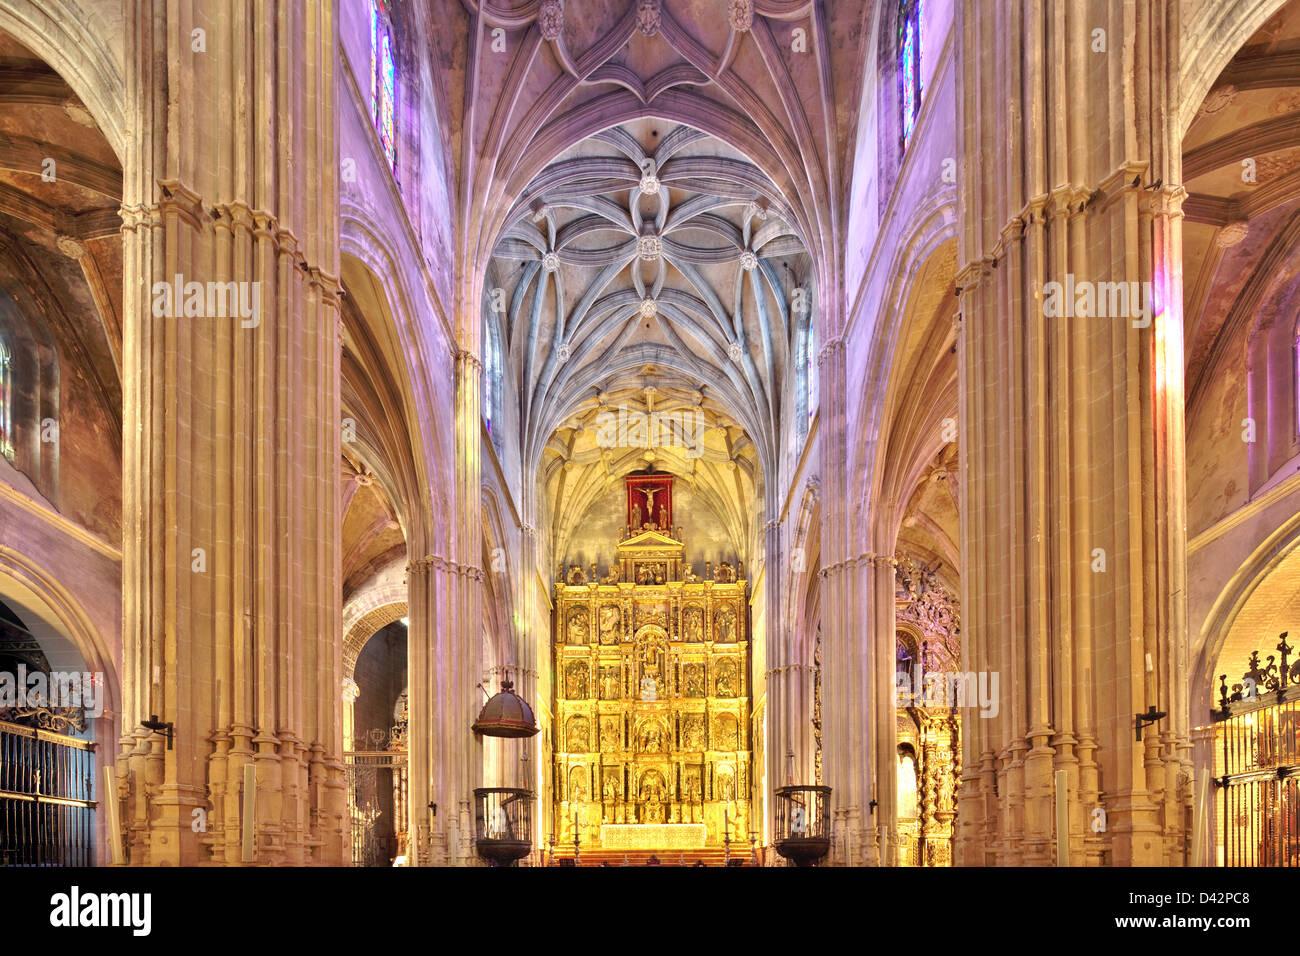 Carmona, Spain, the church of Santa Maria de la Asuncion - Stock Image